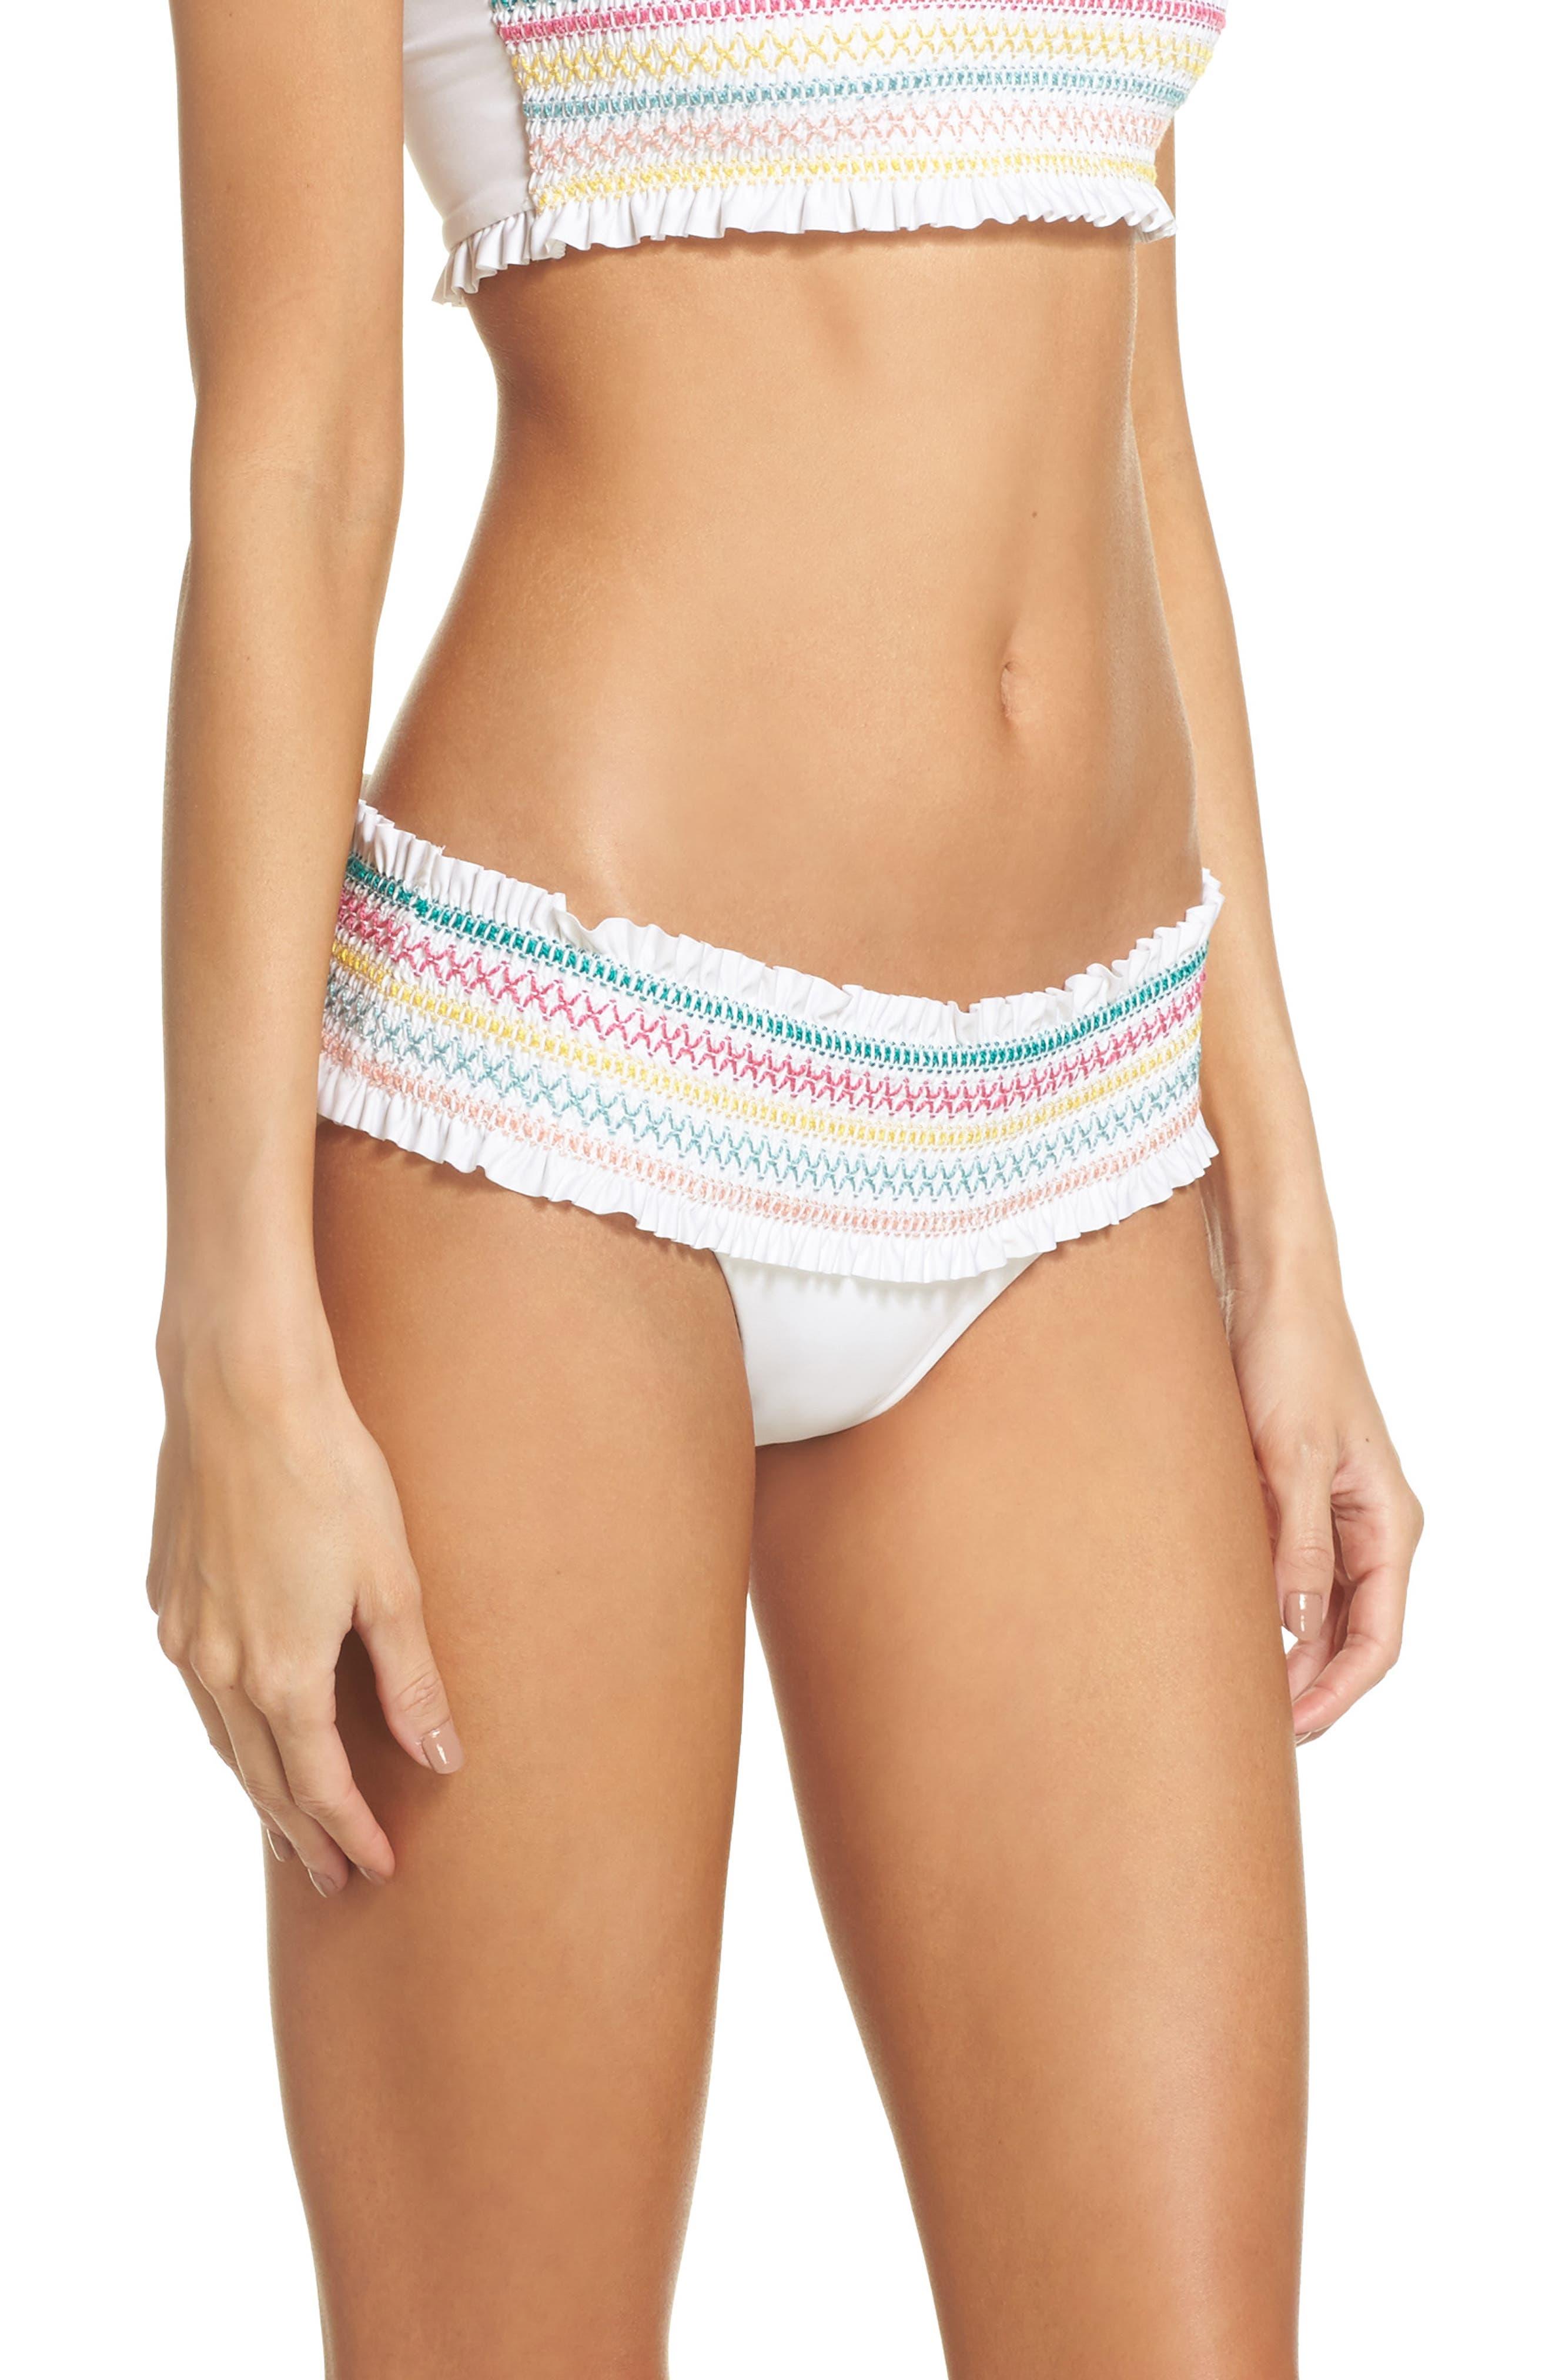 Crystal Cove Smocked Bikini Bottoms,                             Alternate thumbnail 3, color,                             White